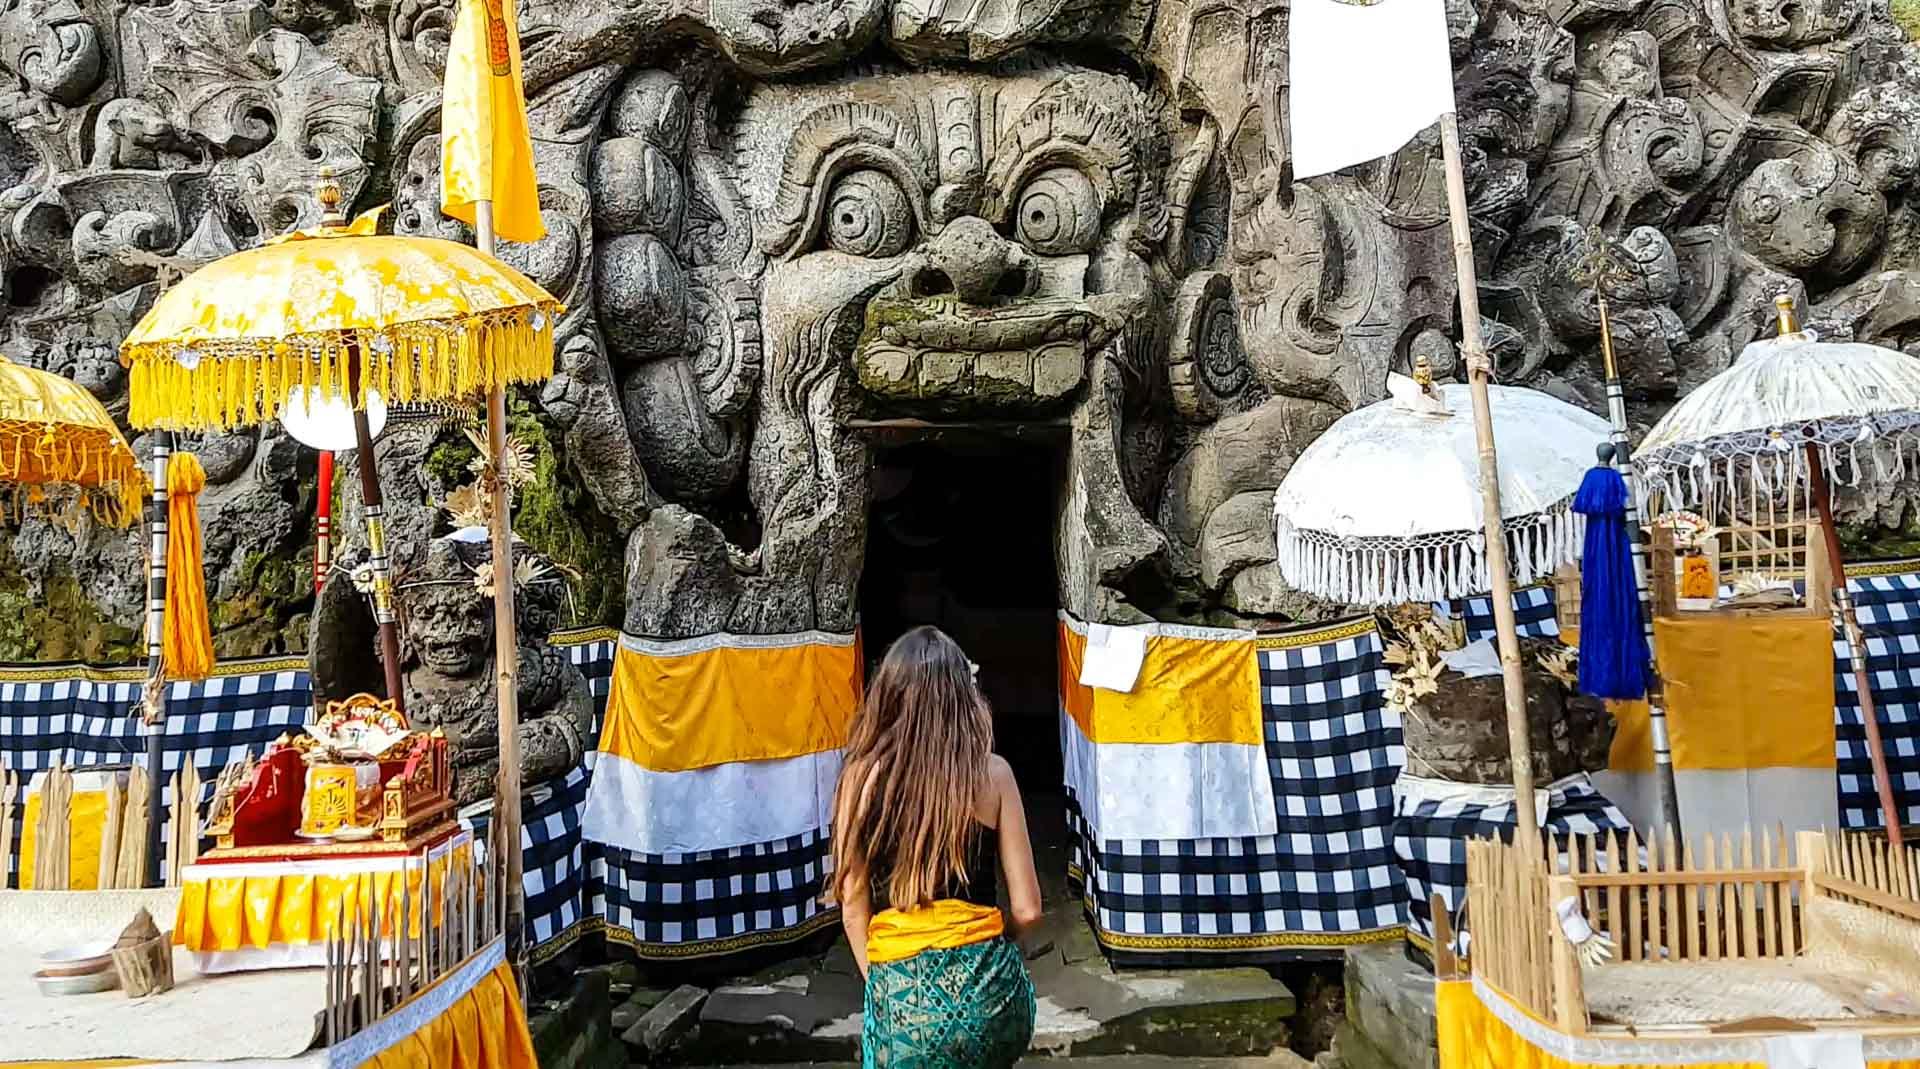 Pura Goa Gajah o Cueva del Elefante, Bali, Indonesia